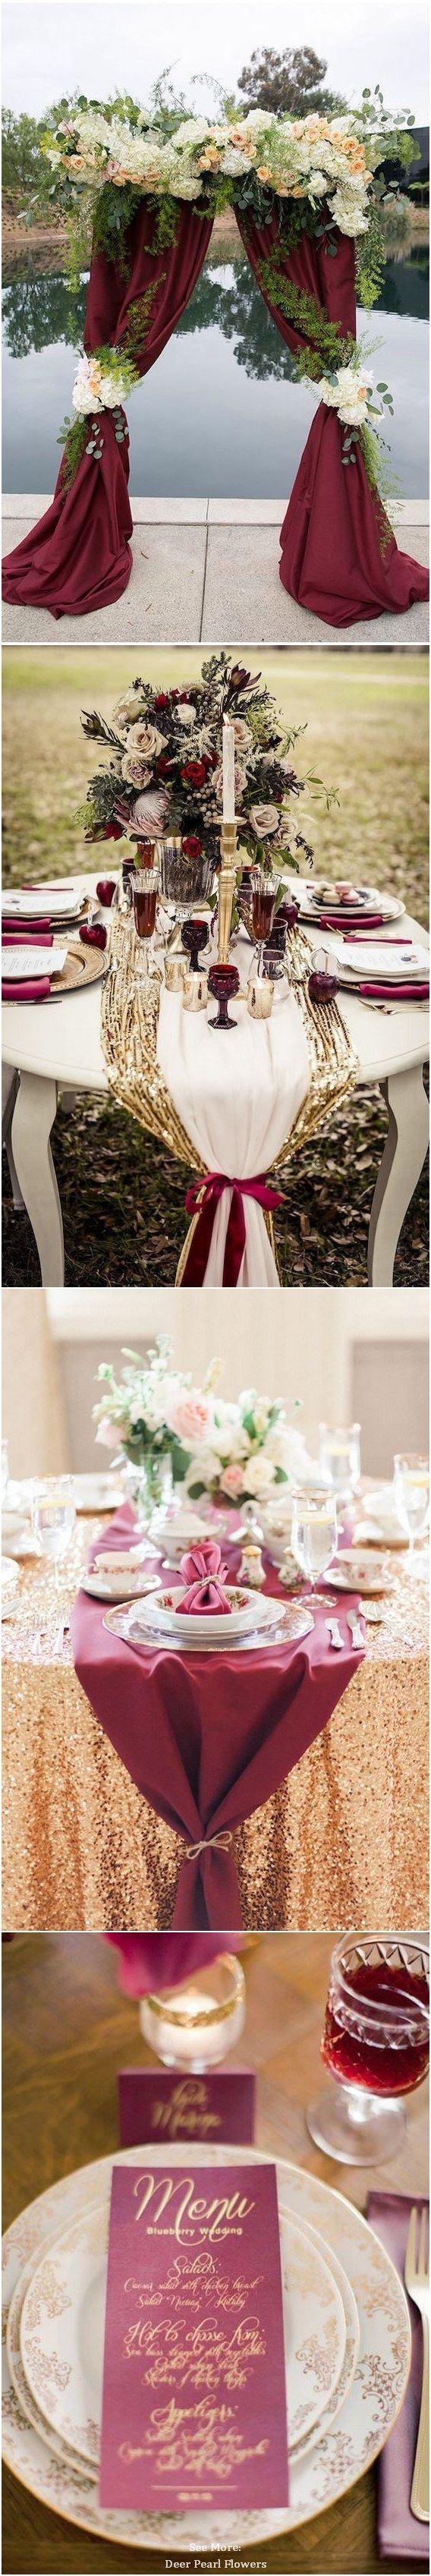 best 25 burgundy wedding colors ideas on pinterest fall wedding